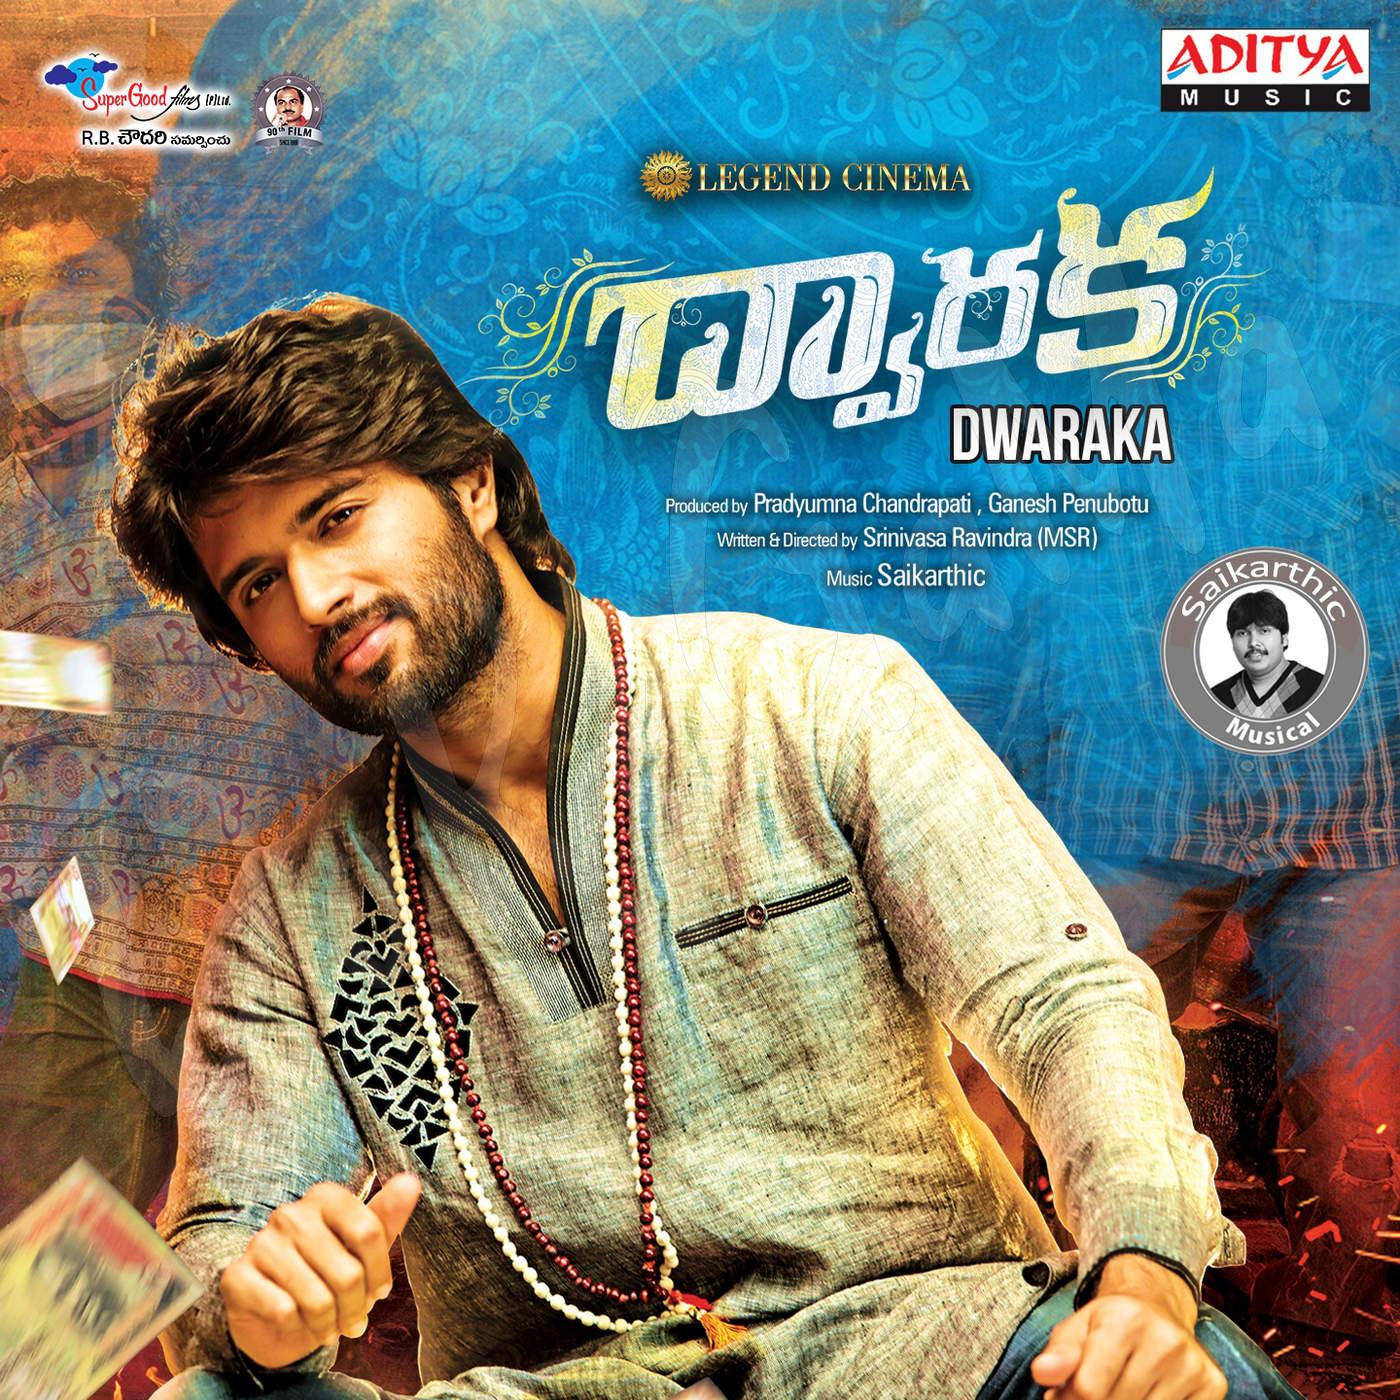 Dwaraka-2016-Original-CD-Front-Cover-Poster-Wallpaper